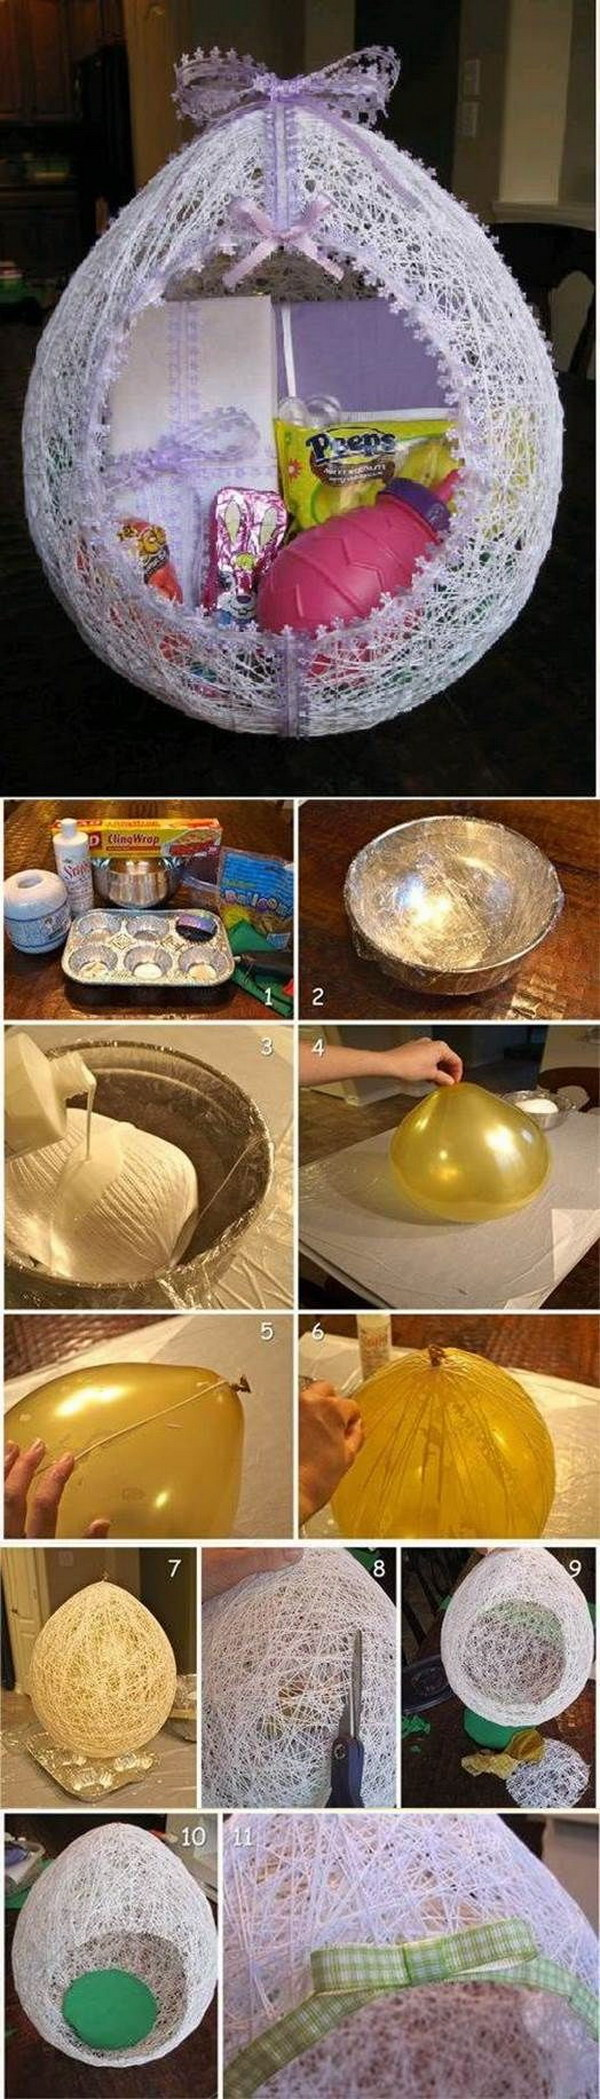 Egg Shaped Easter Basket From String.